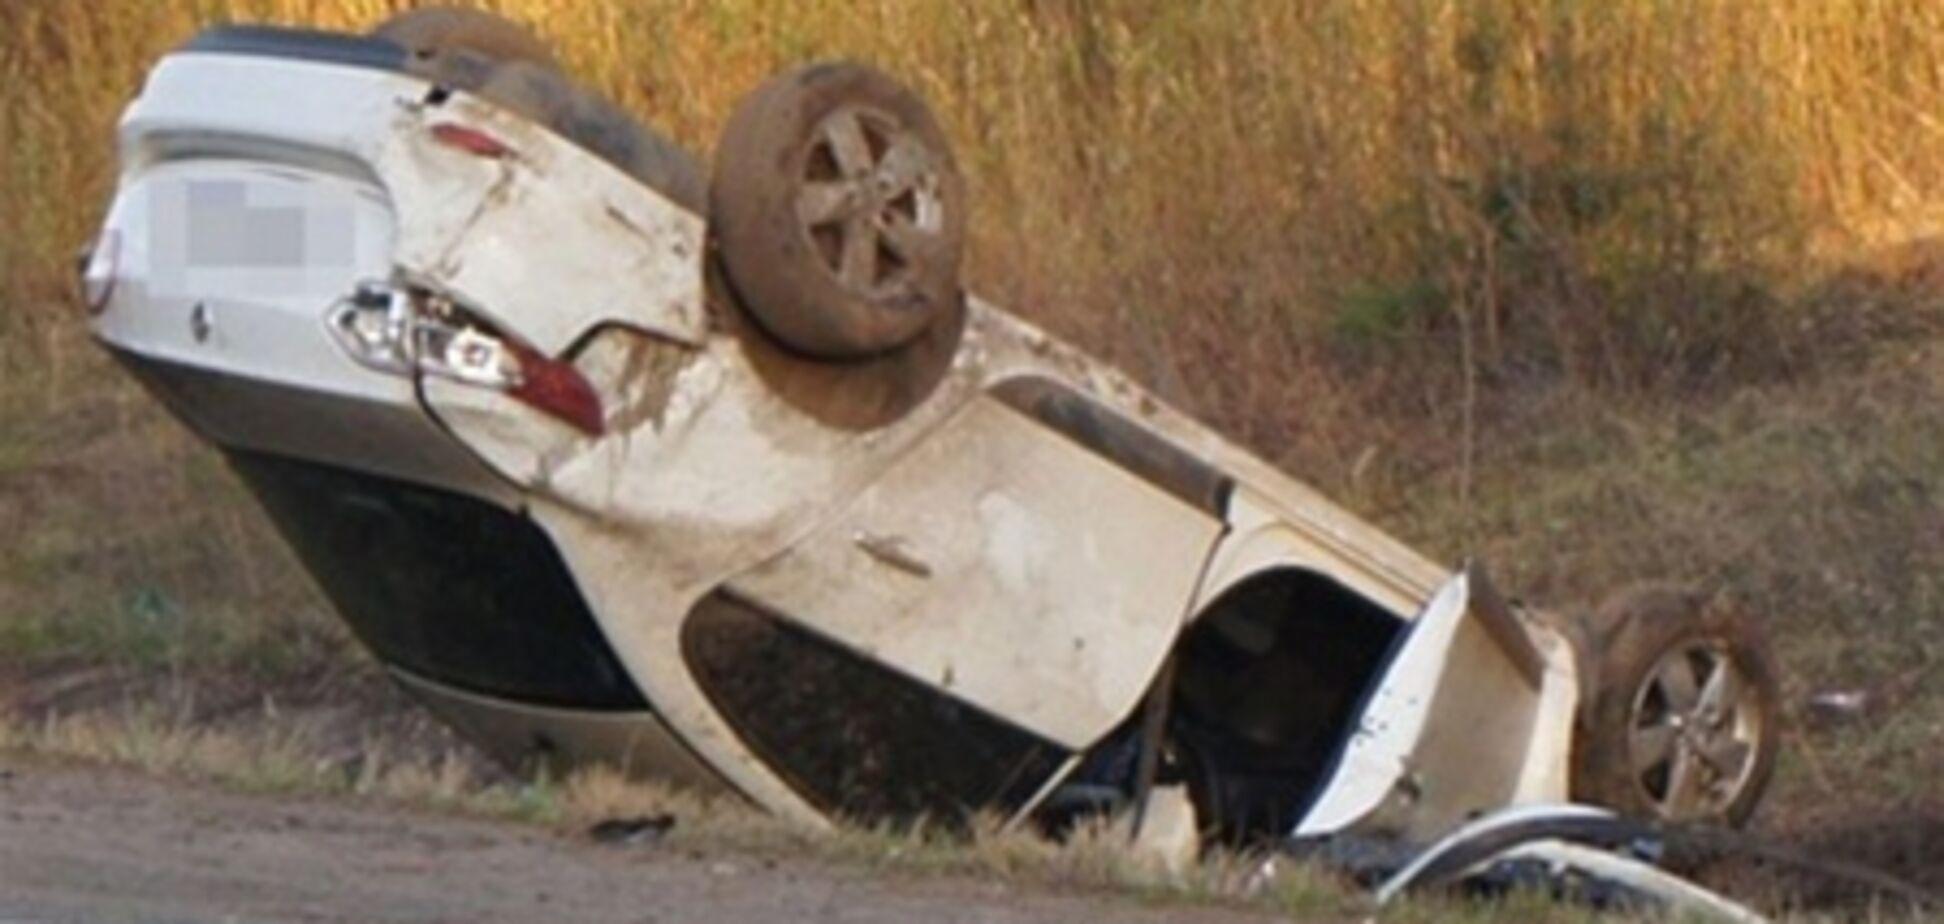 Ситуация на дорогах 13 октября: 111 ДТП, 13 погибших